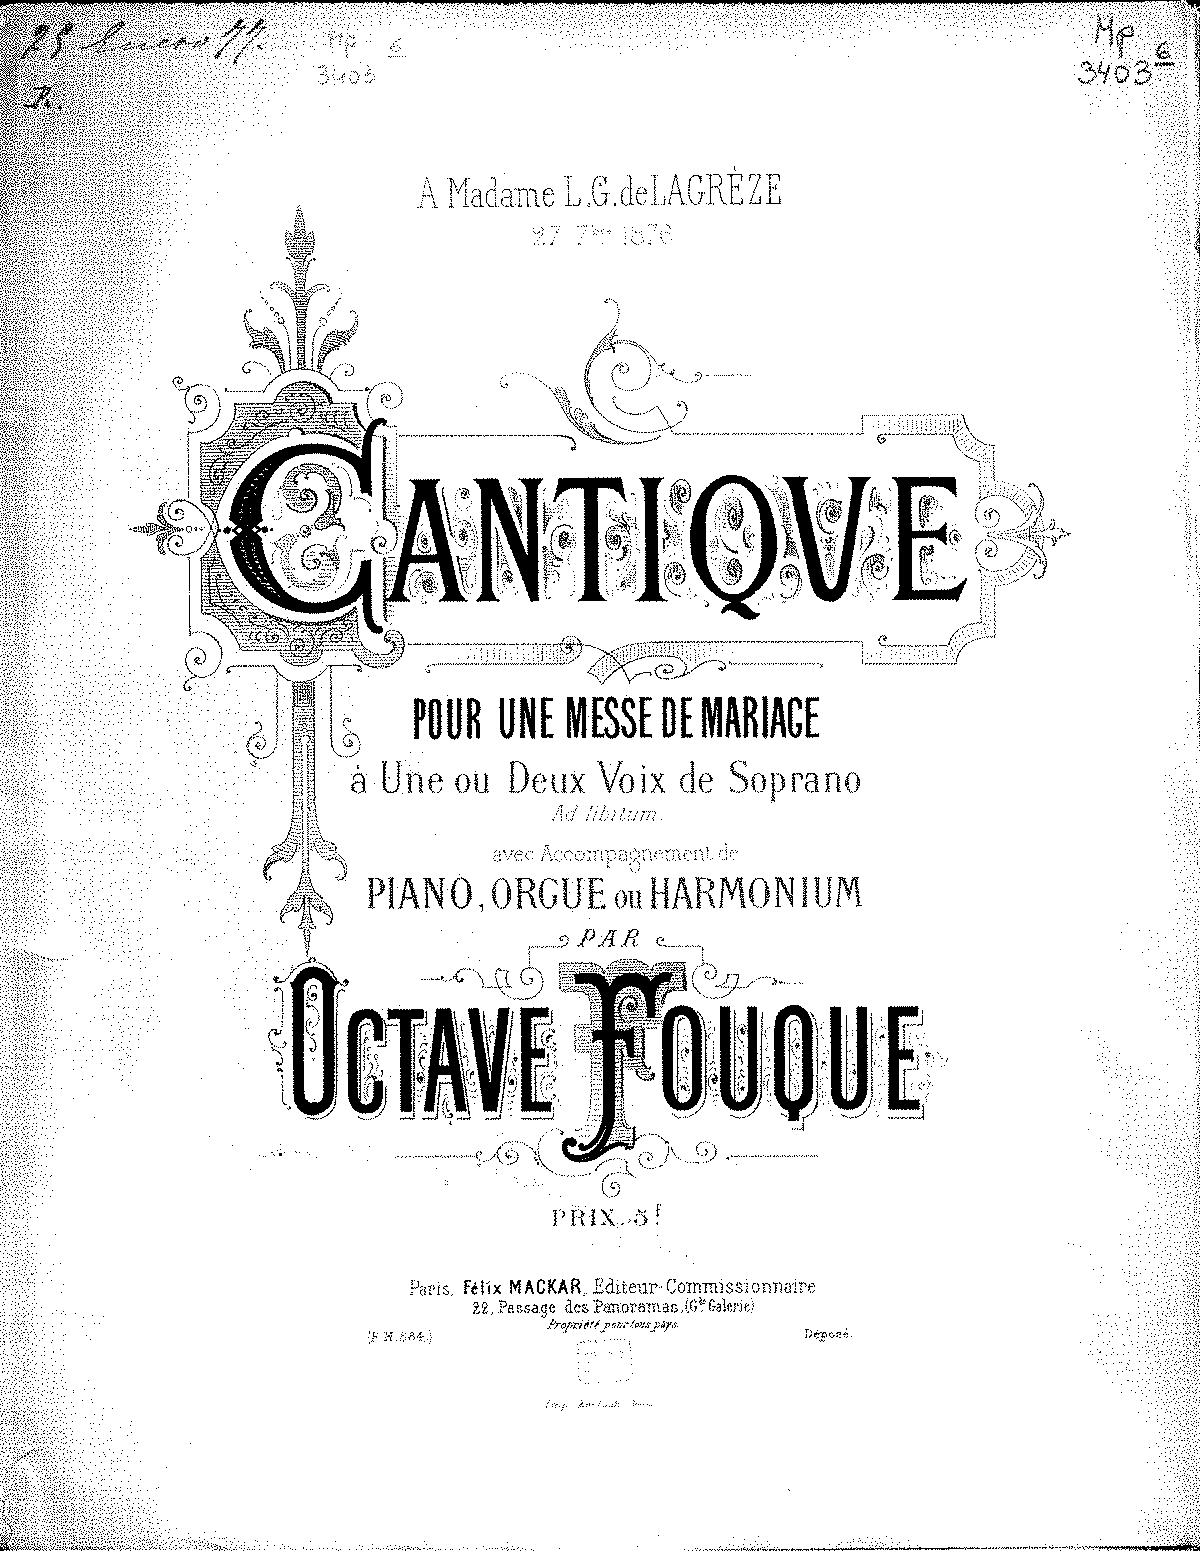 Cantique (Fouque, Octave) - IMSLP/Petrucci Music Library: Free